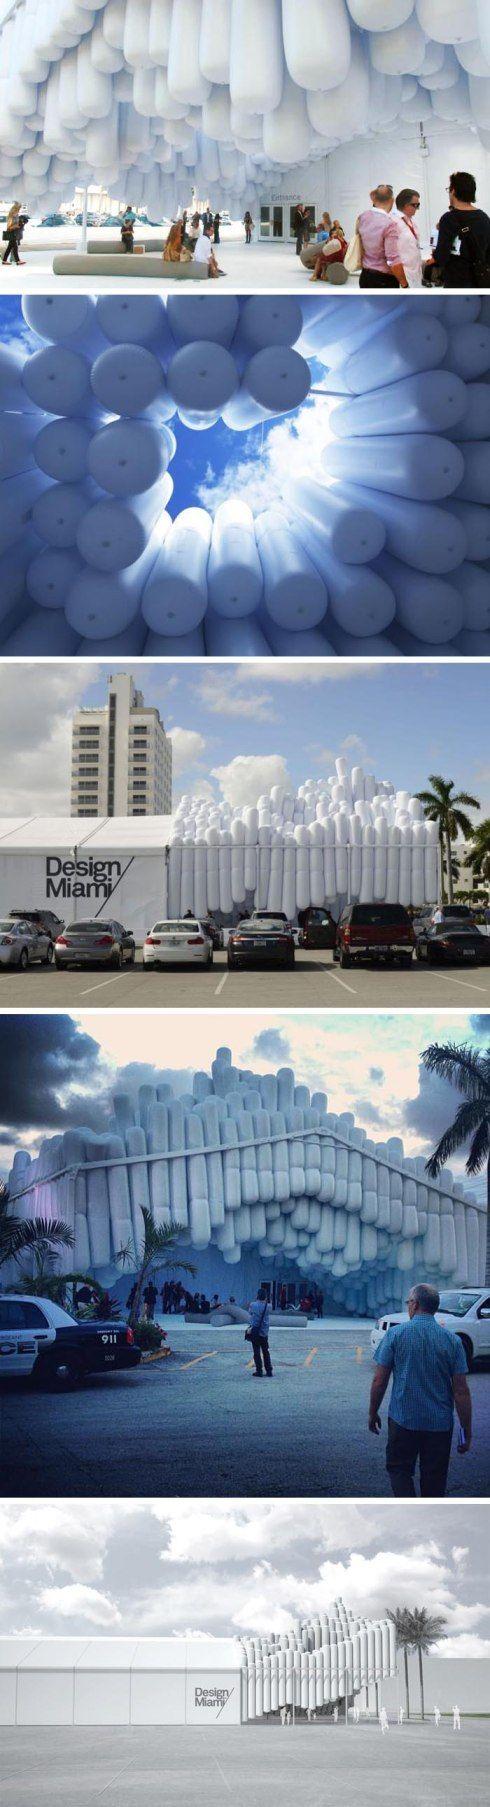 Design Miami 2012, Cool entrance installation by Daniel Arsham, Snarkitecture, Drift